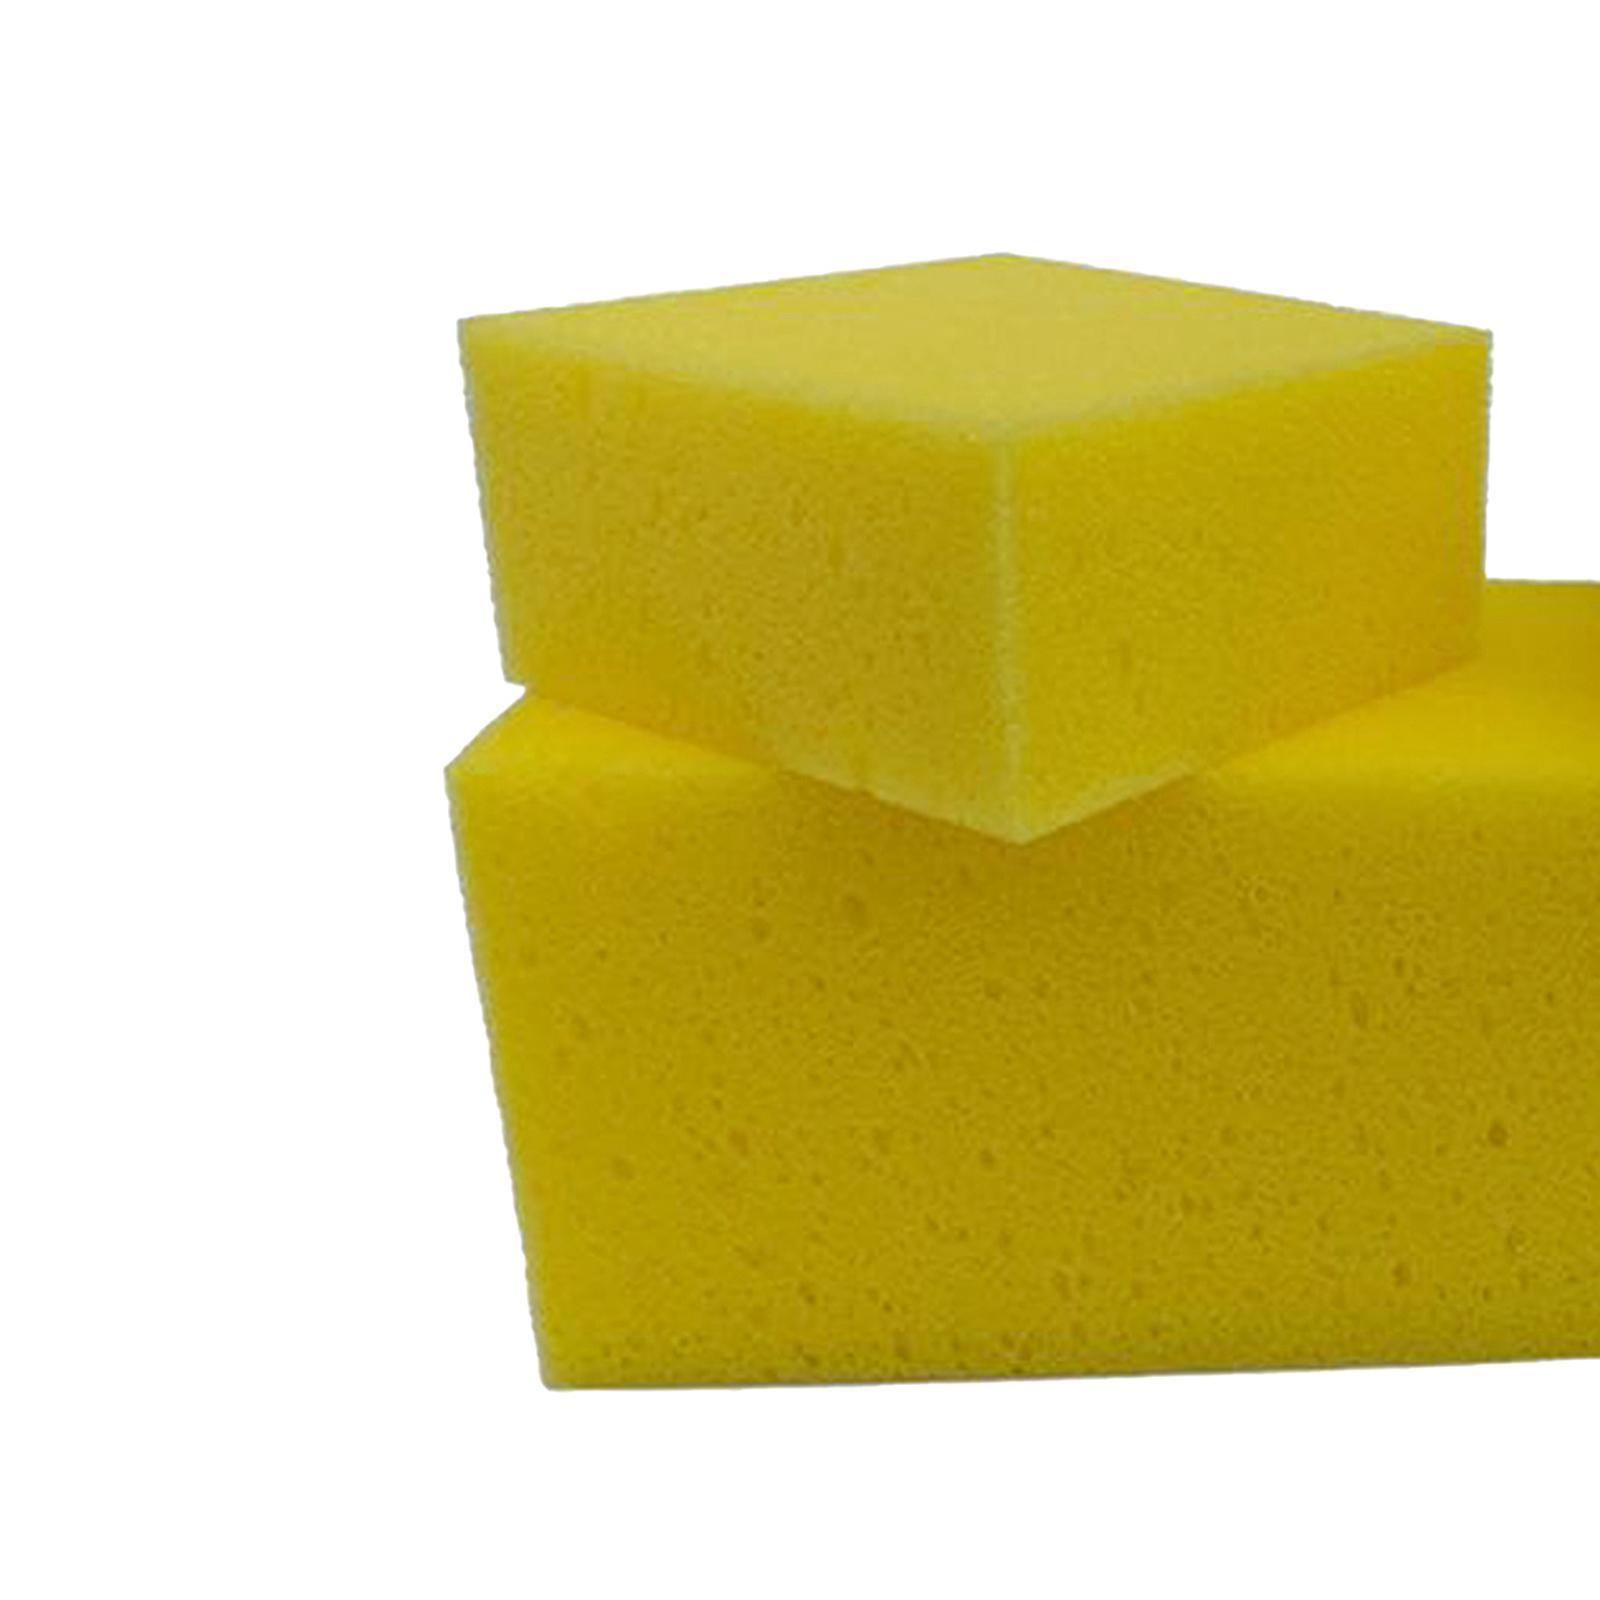 Auto Car Foam Sponges Block Cellulose Sponge Multi-uses for Glass Dish Cup